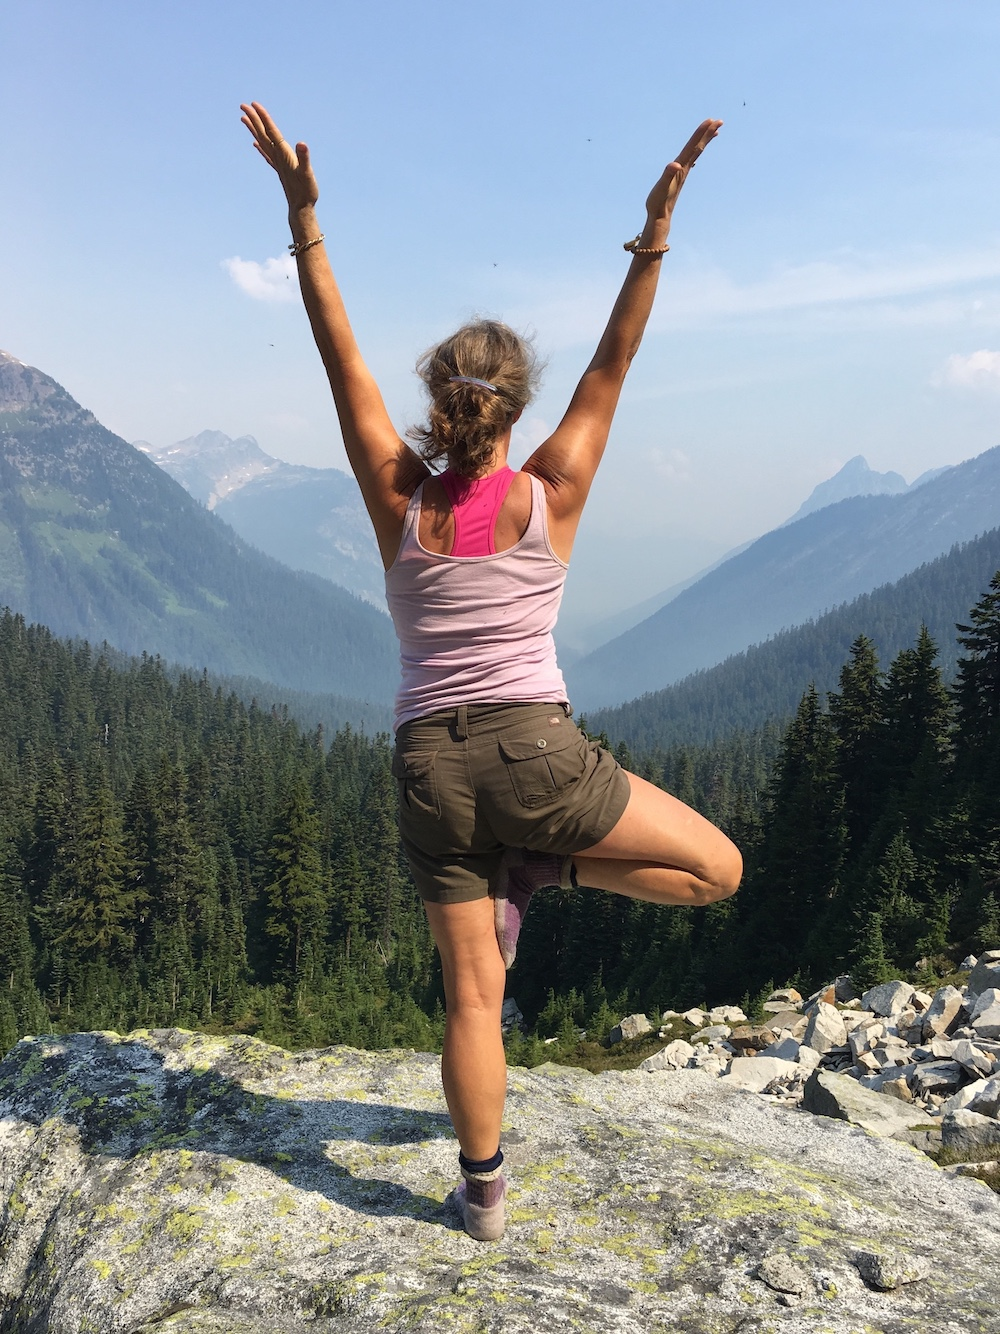 evolve-and-radiate-aditi-grandy-yoga-sessions-tree-pose.jpg